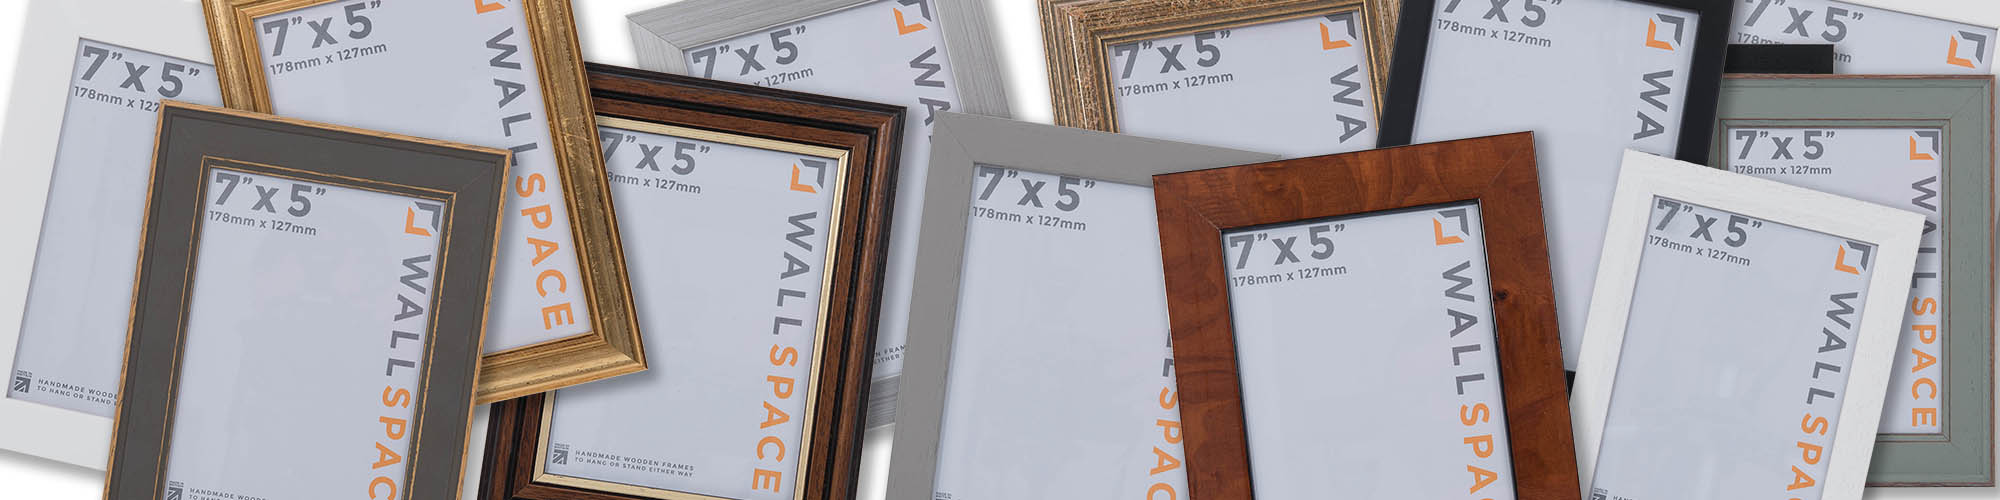 "7"" x 5"" Photo Frames"